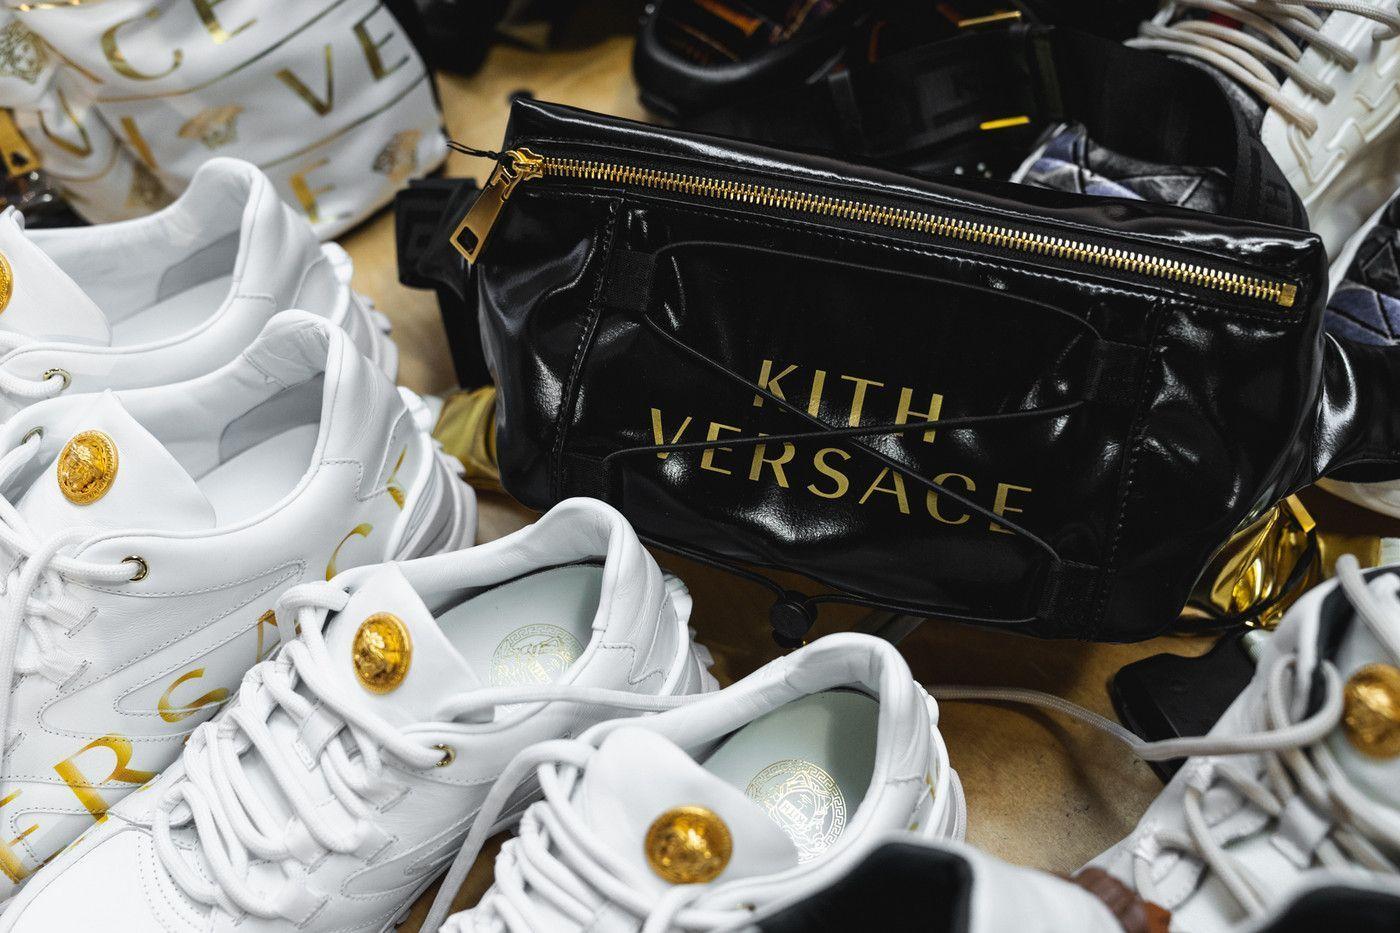 KITH x Vesace